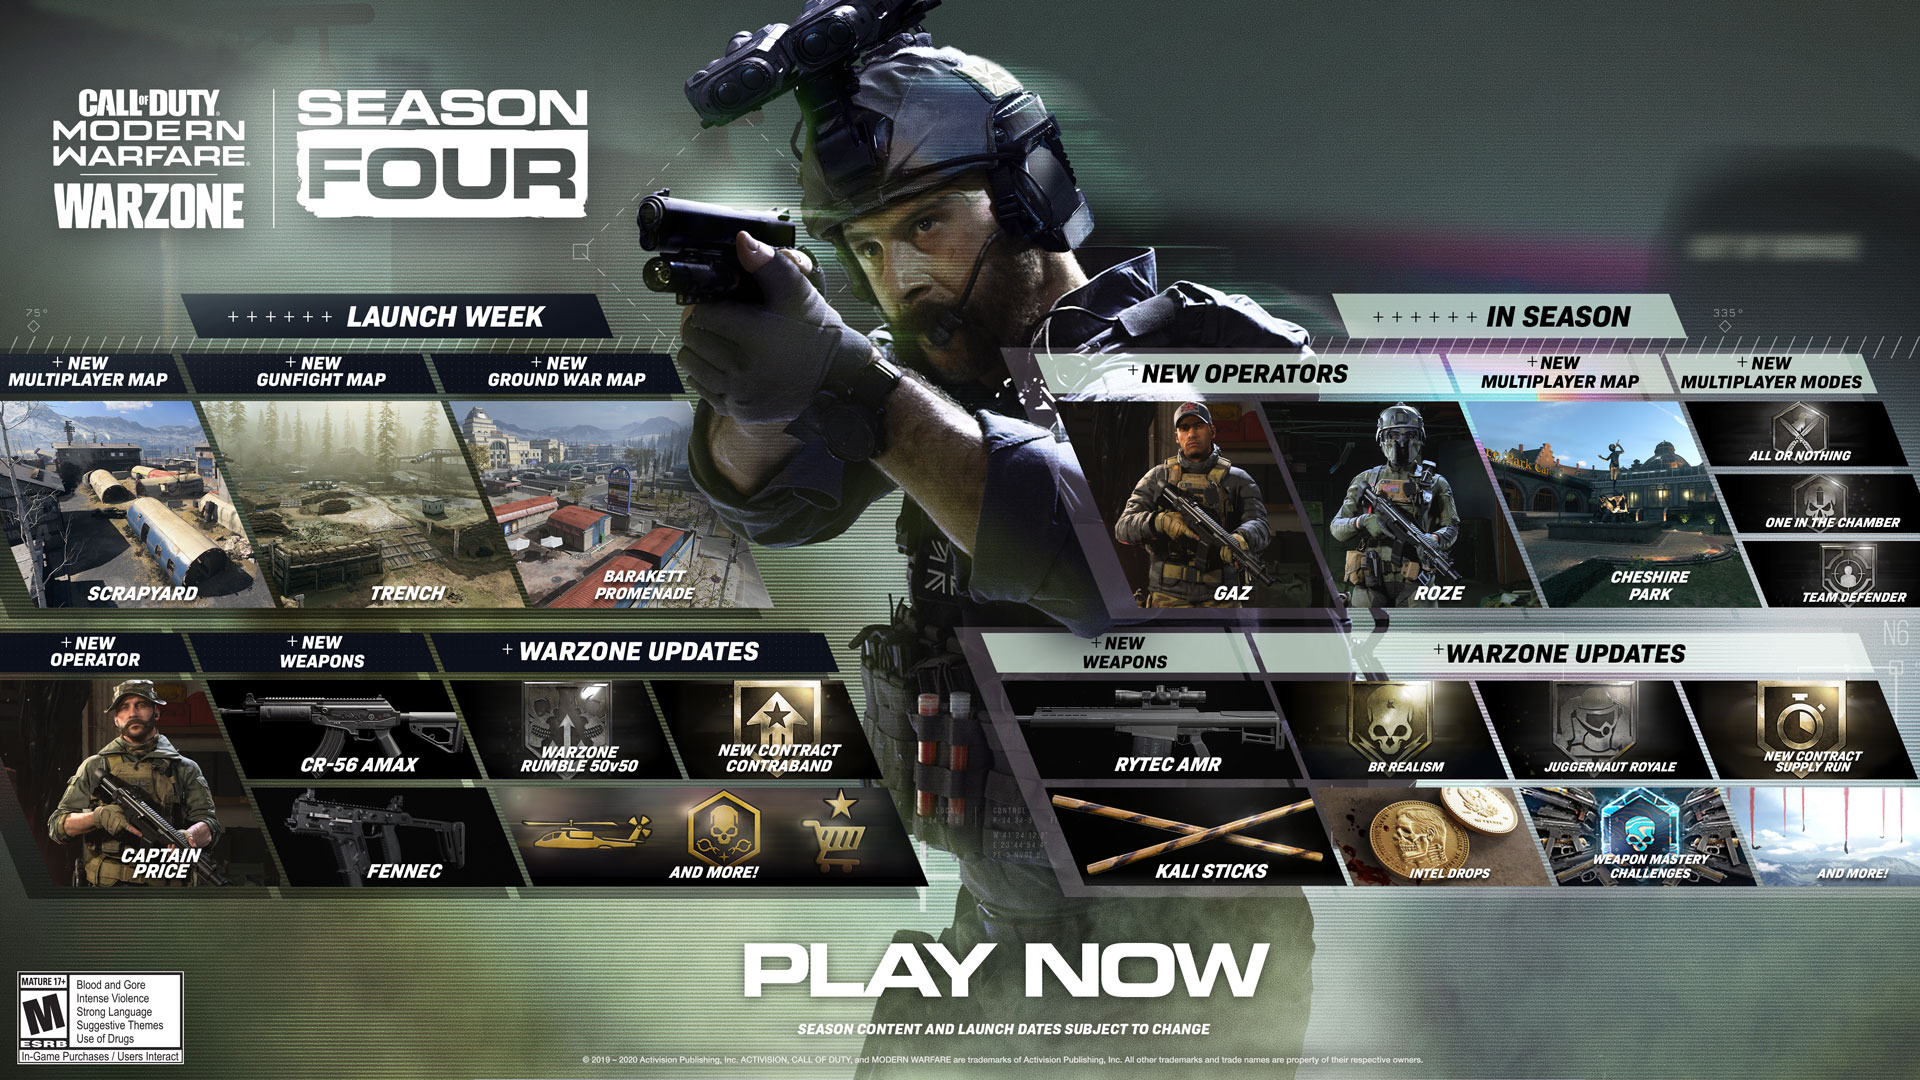 Modern Warfare's Season 4 roadmap